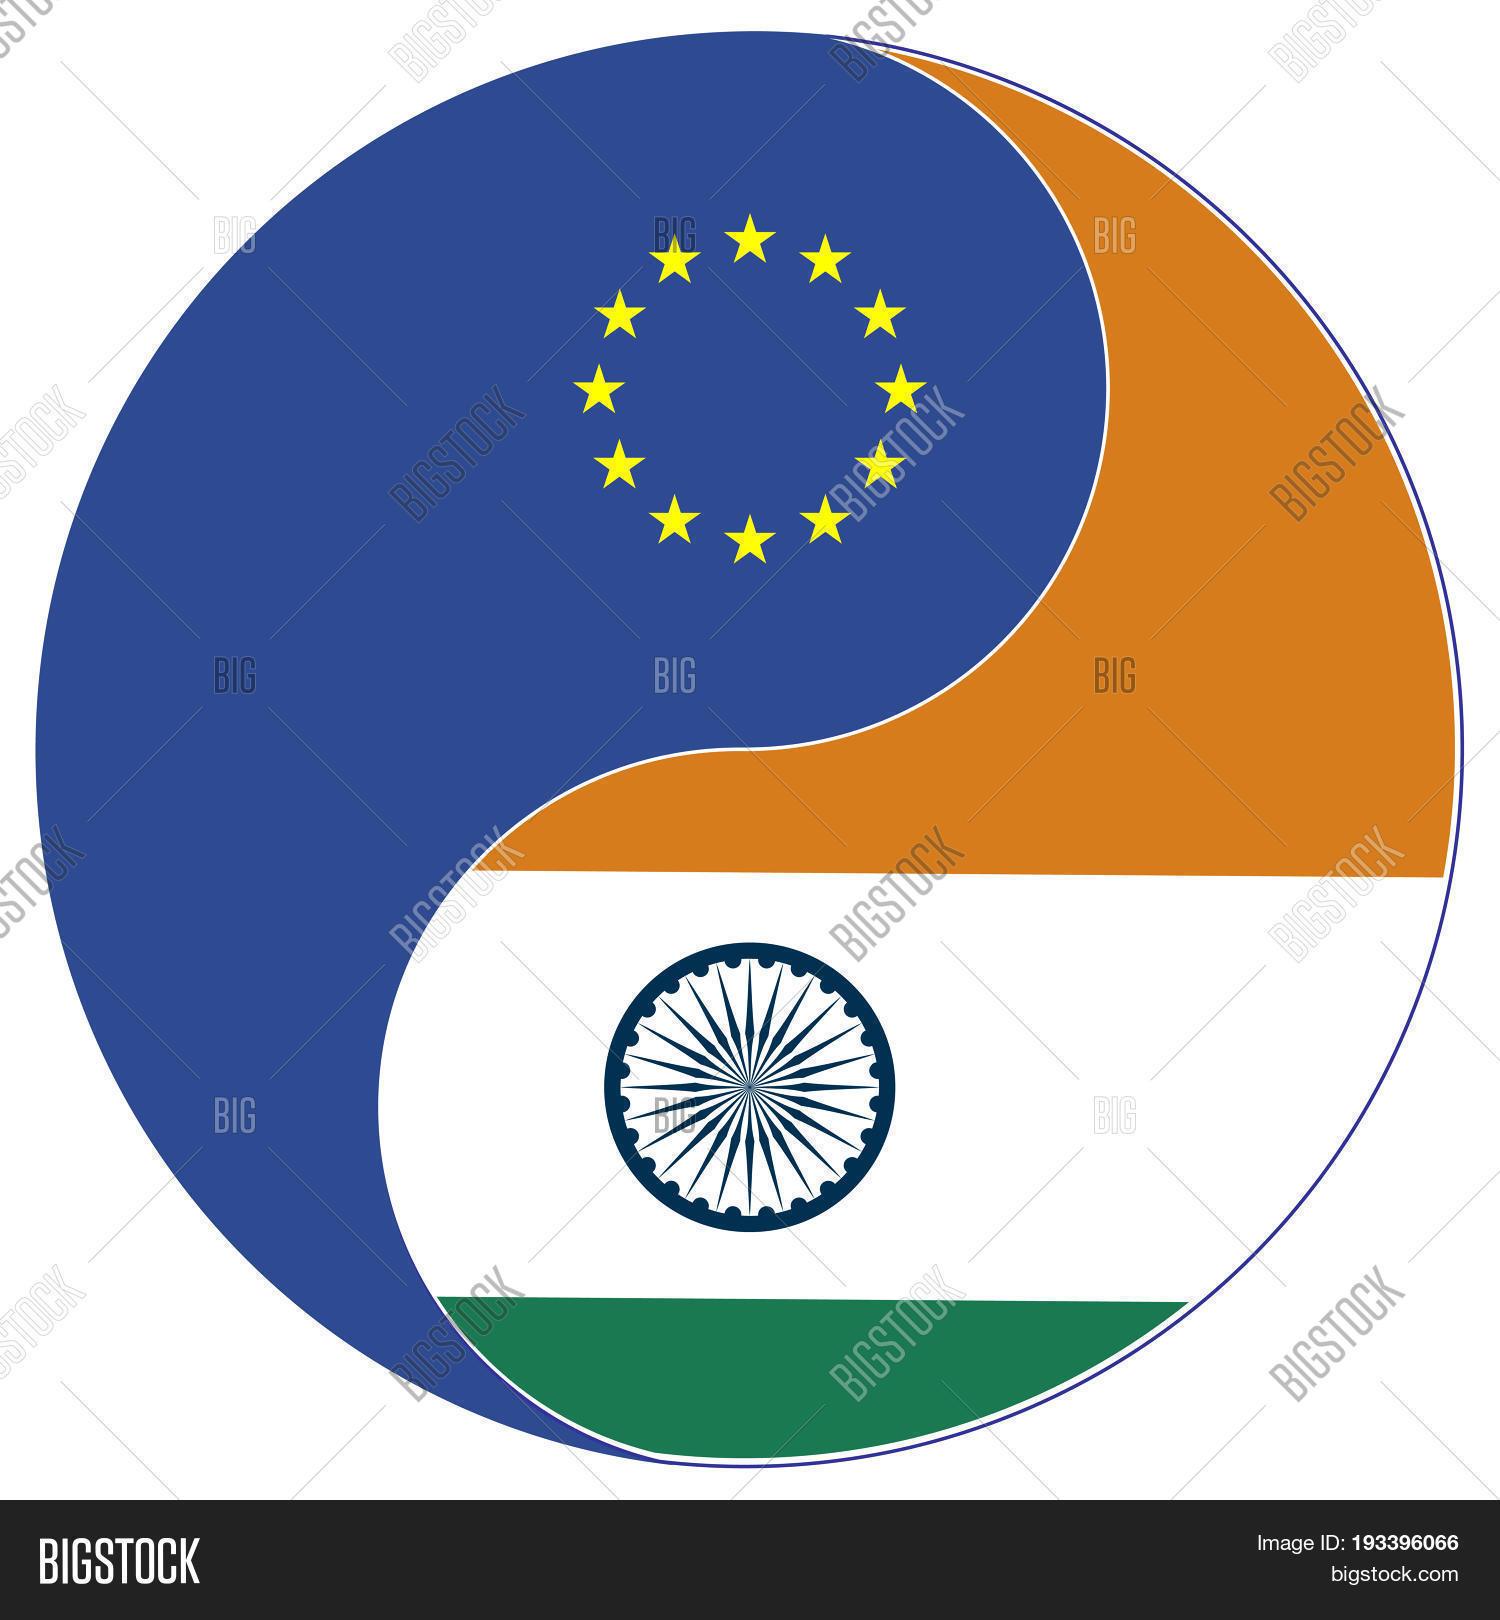 Eu India Trade Image Photo Free Trial Bigstock